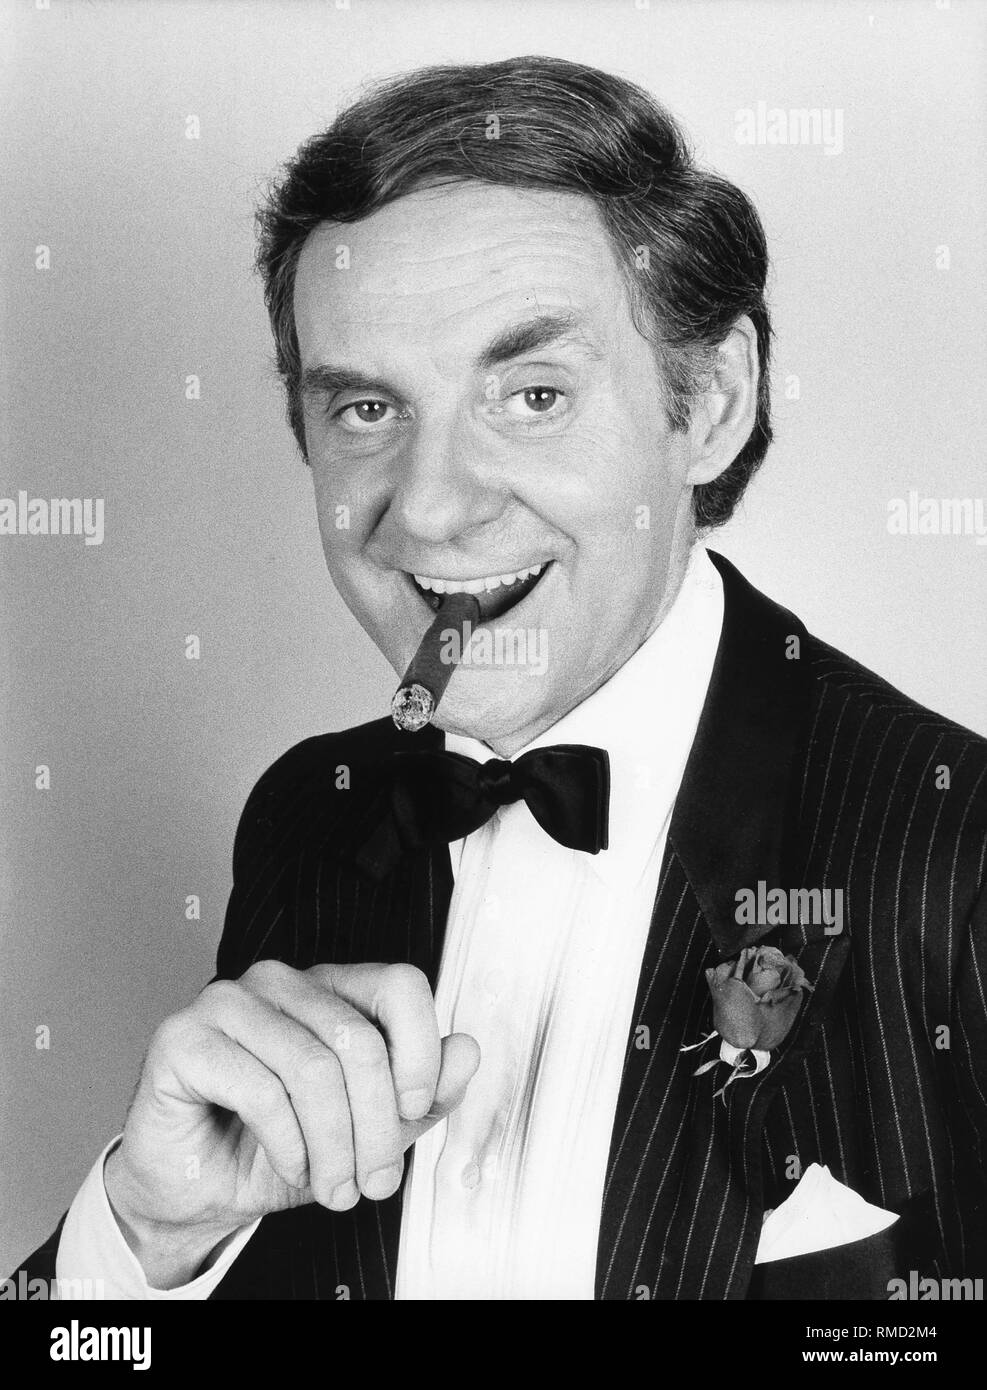 Actor Harald Juhnke in 1984. - Stock Image